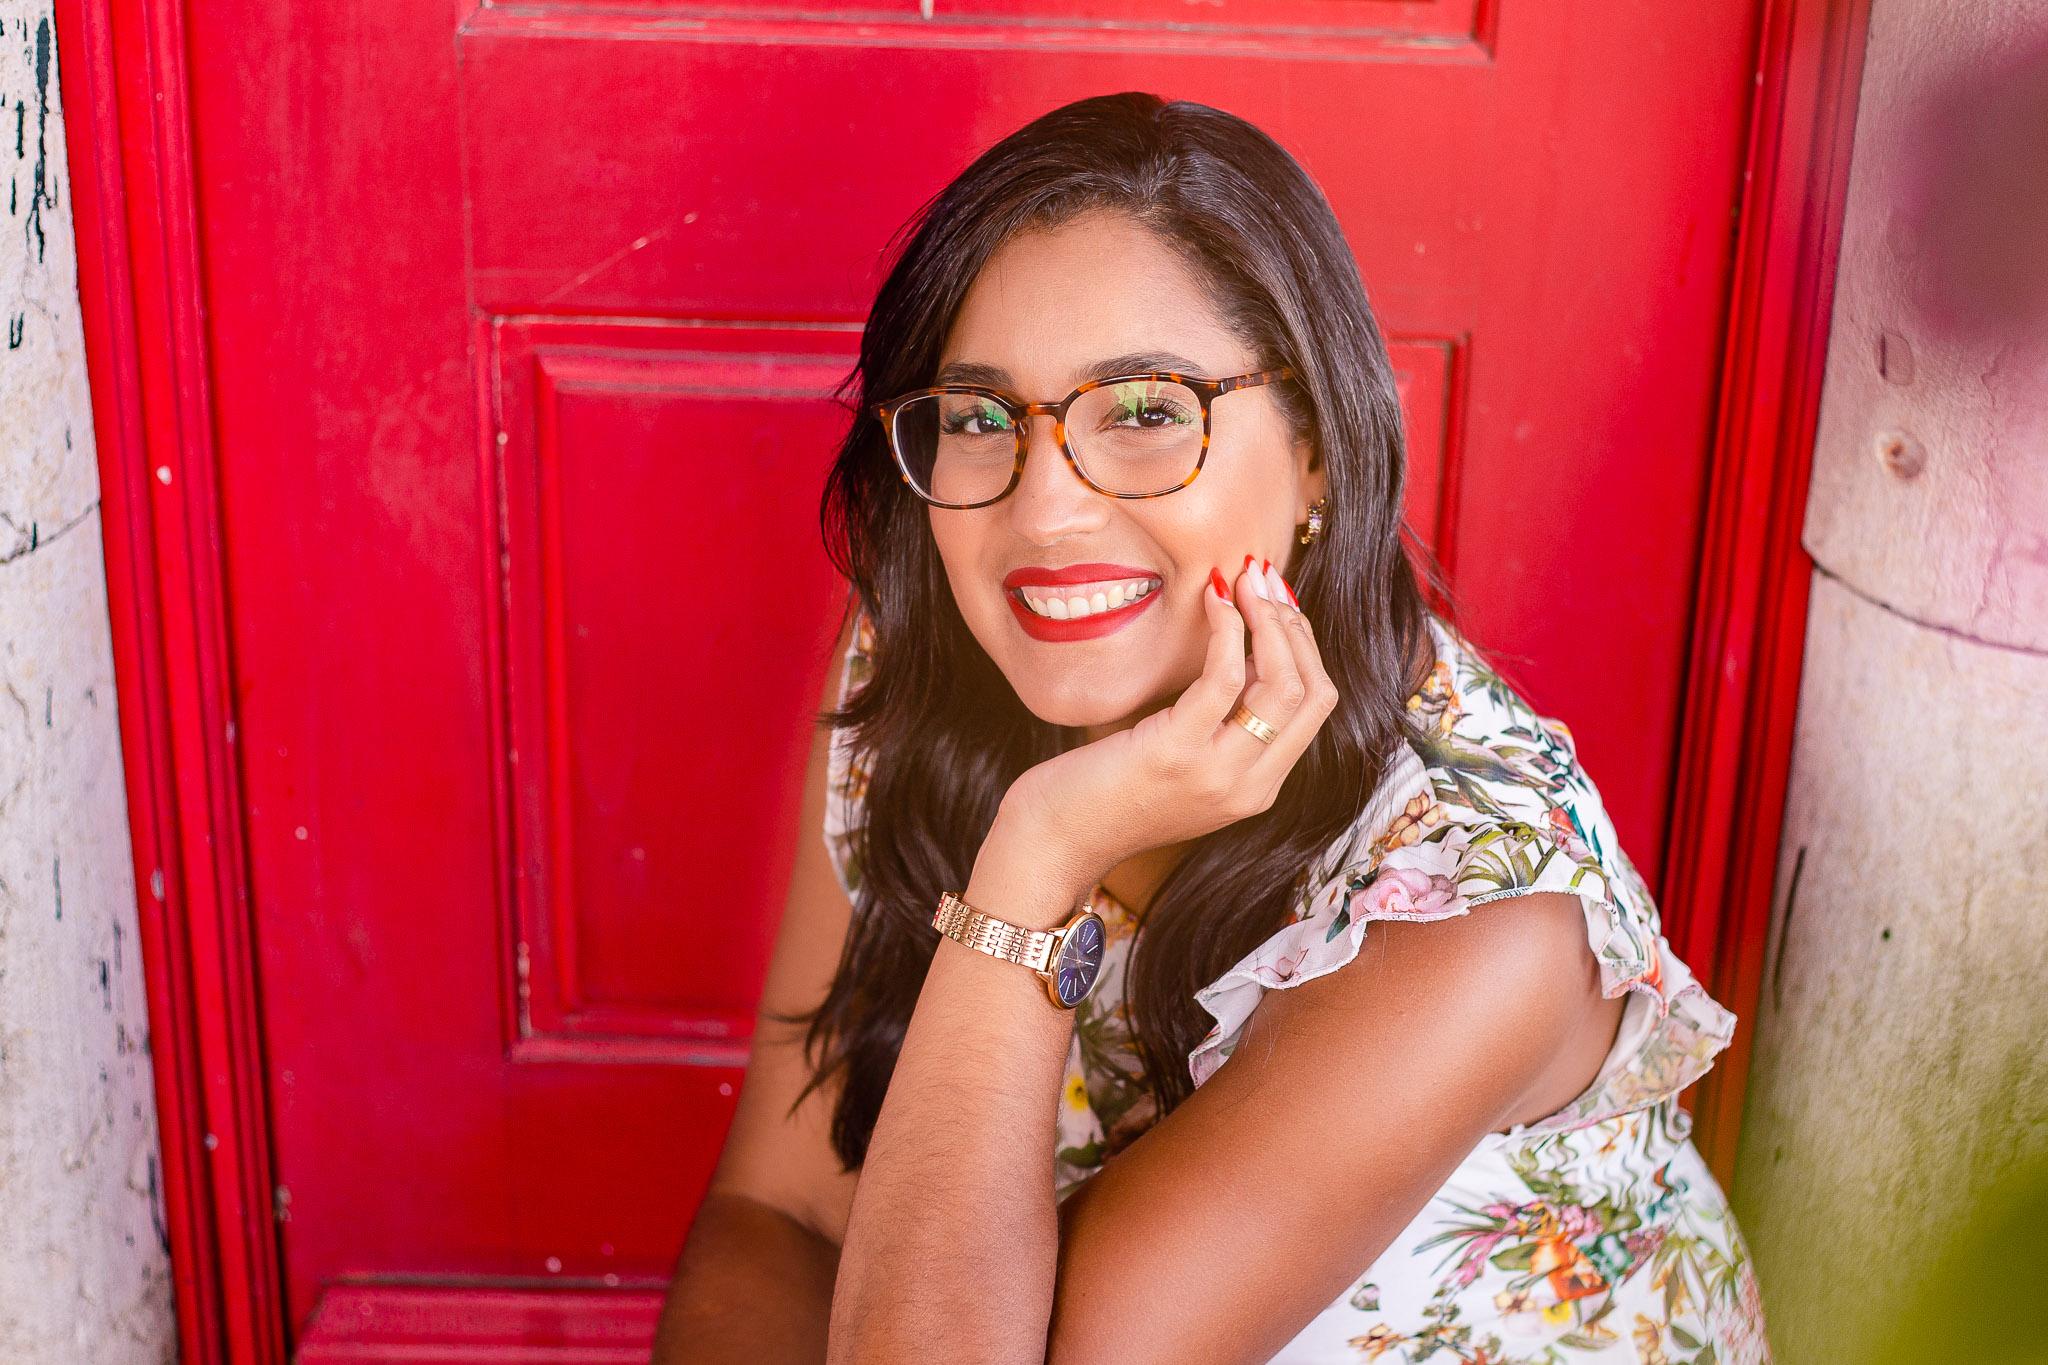 Jessica Lopes